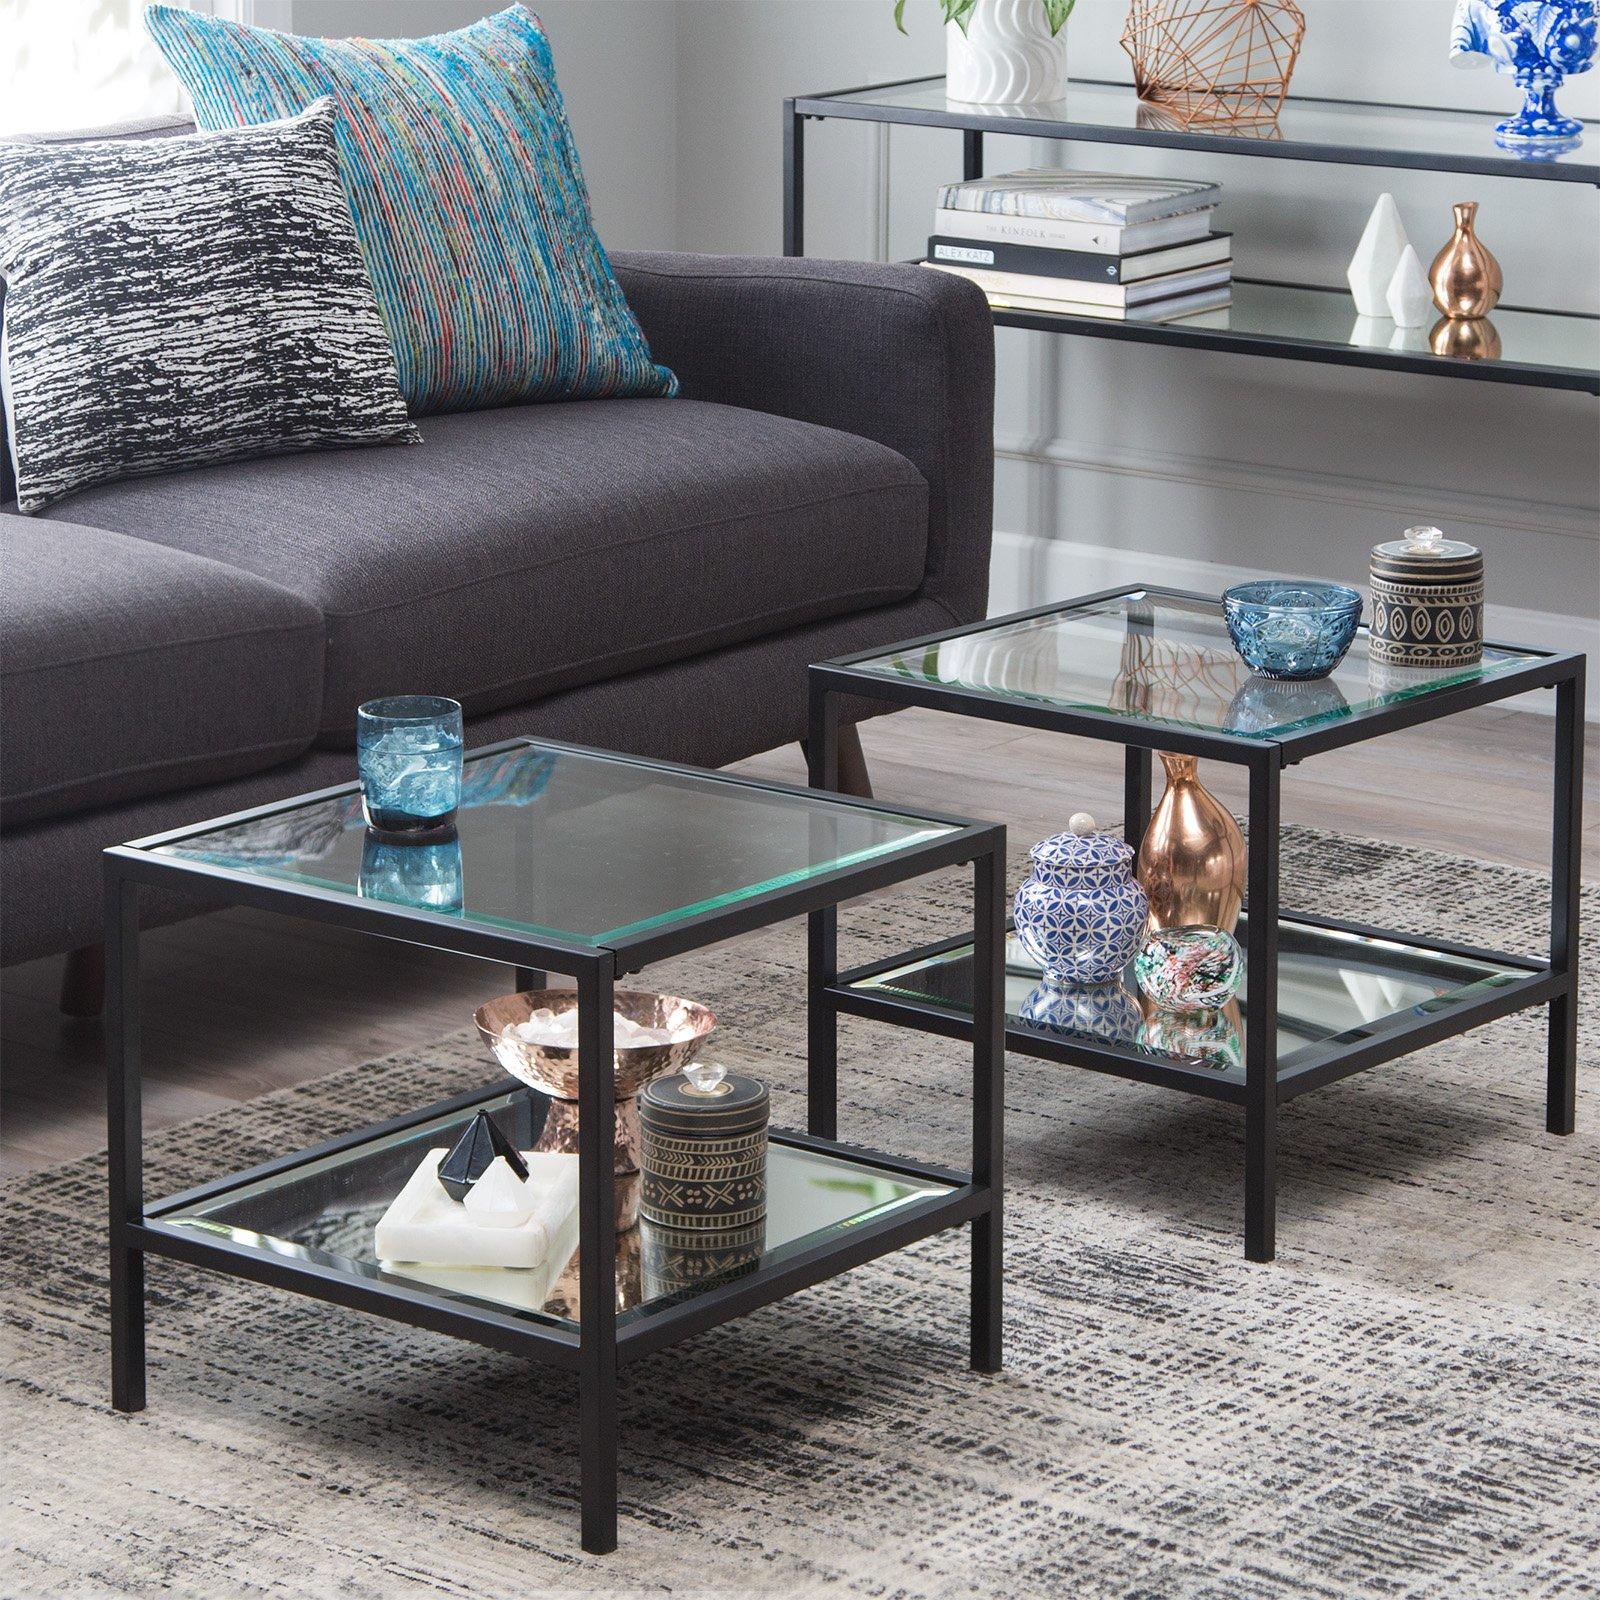 Belham Living Lamont Bunching Coffee Table Black Coffee Tables